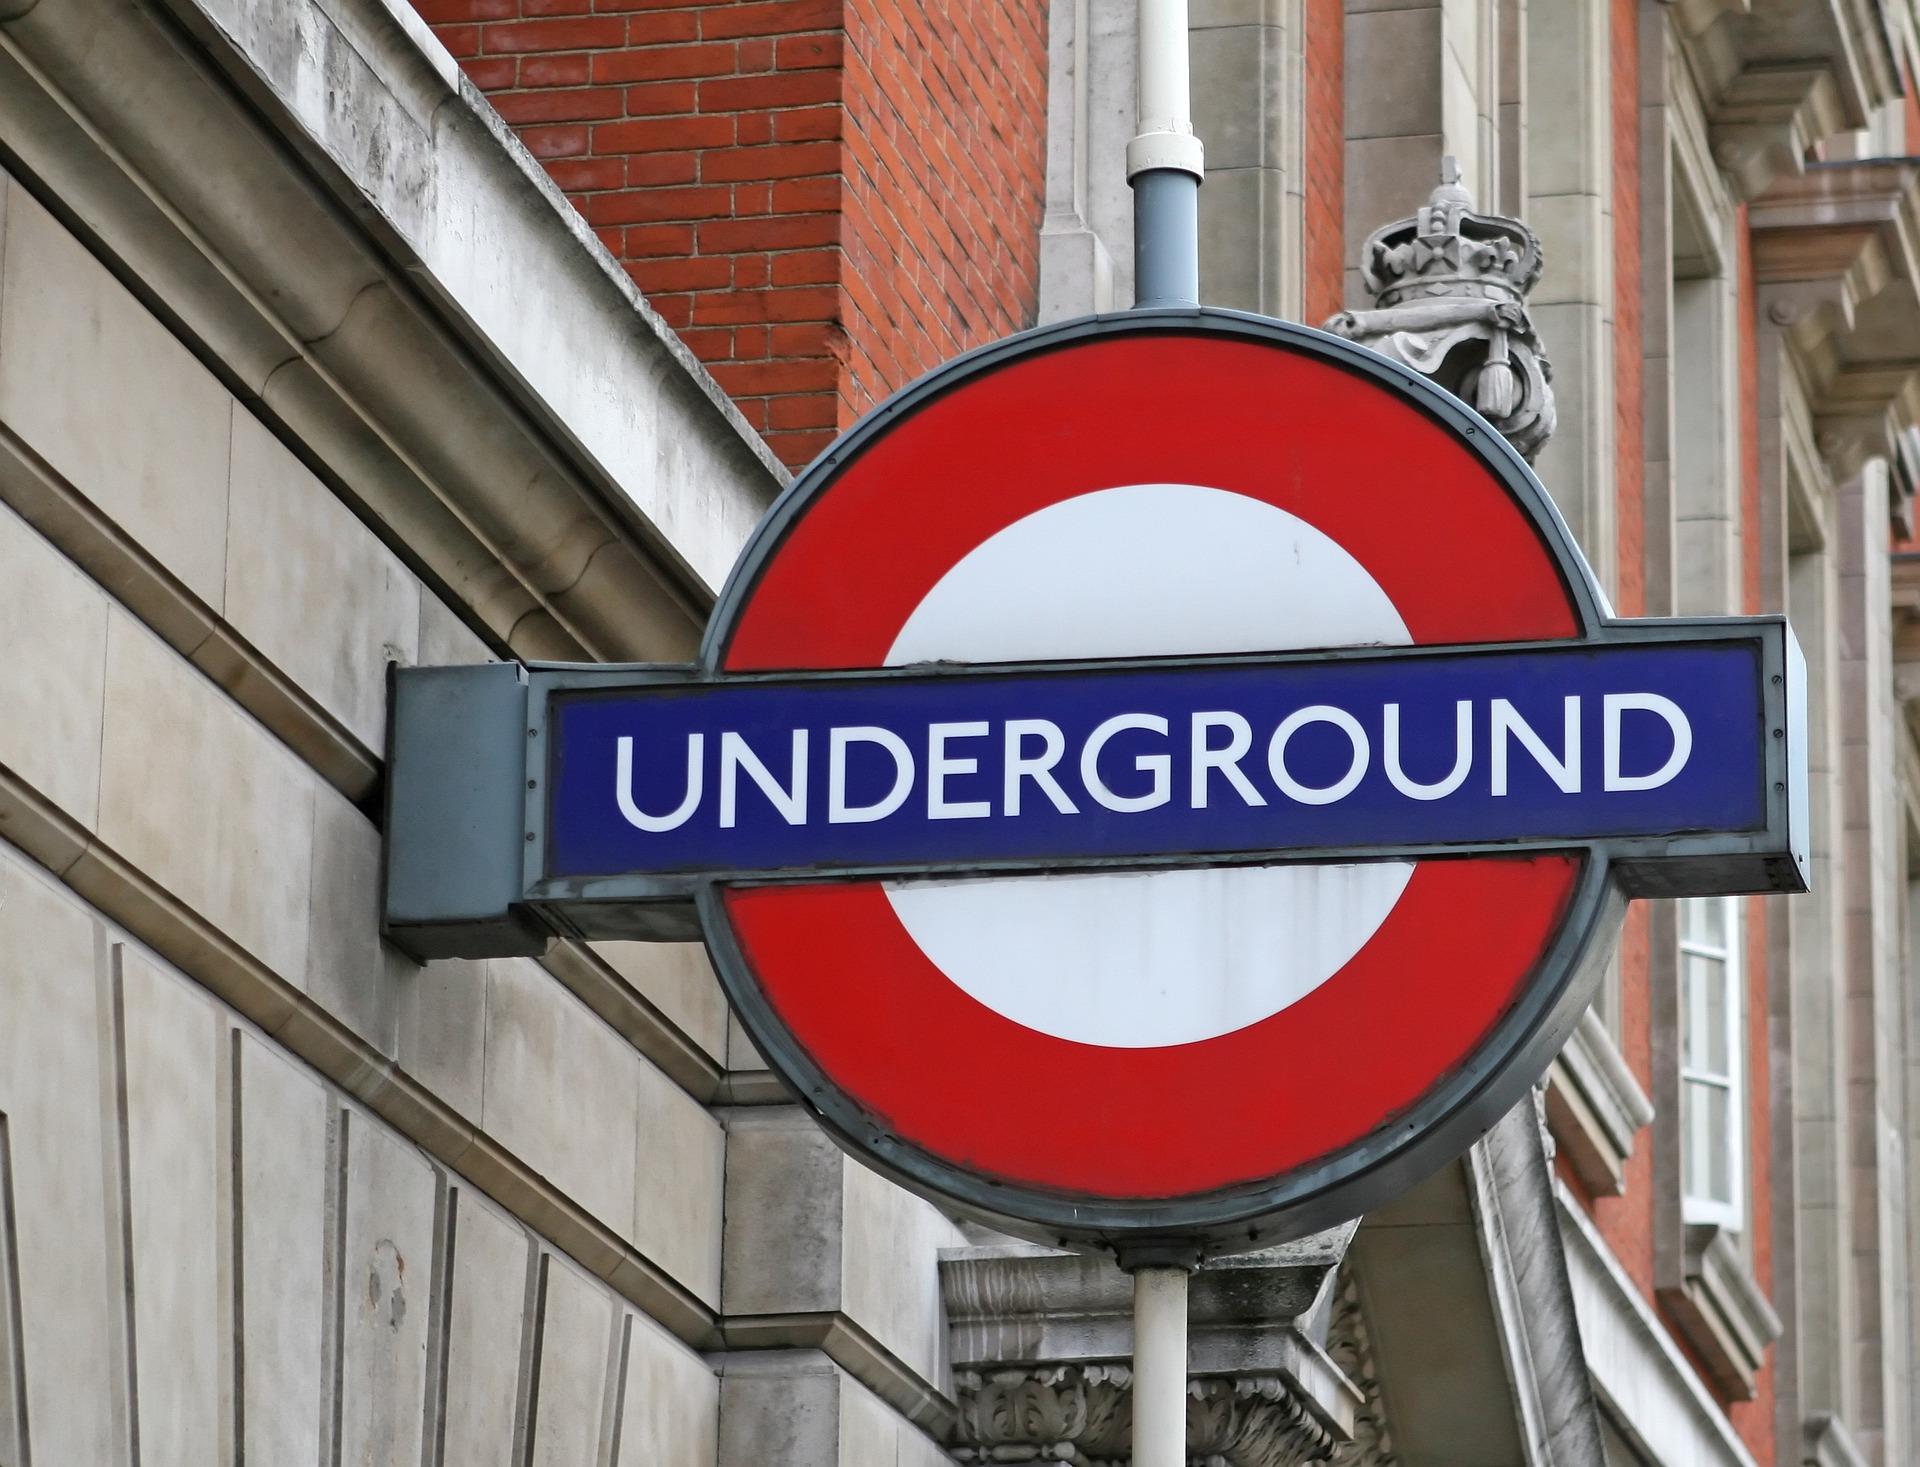 Commuting to University on the London Underground